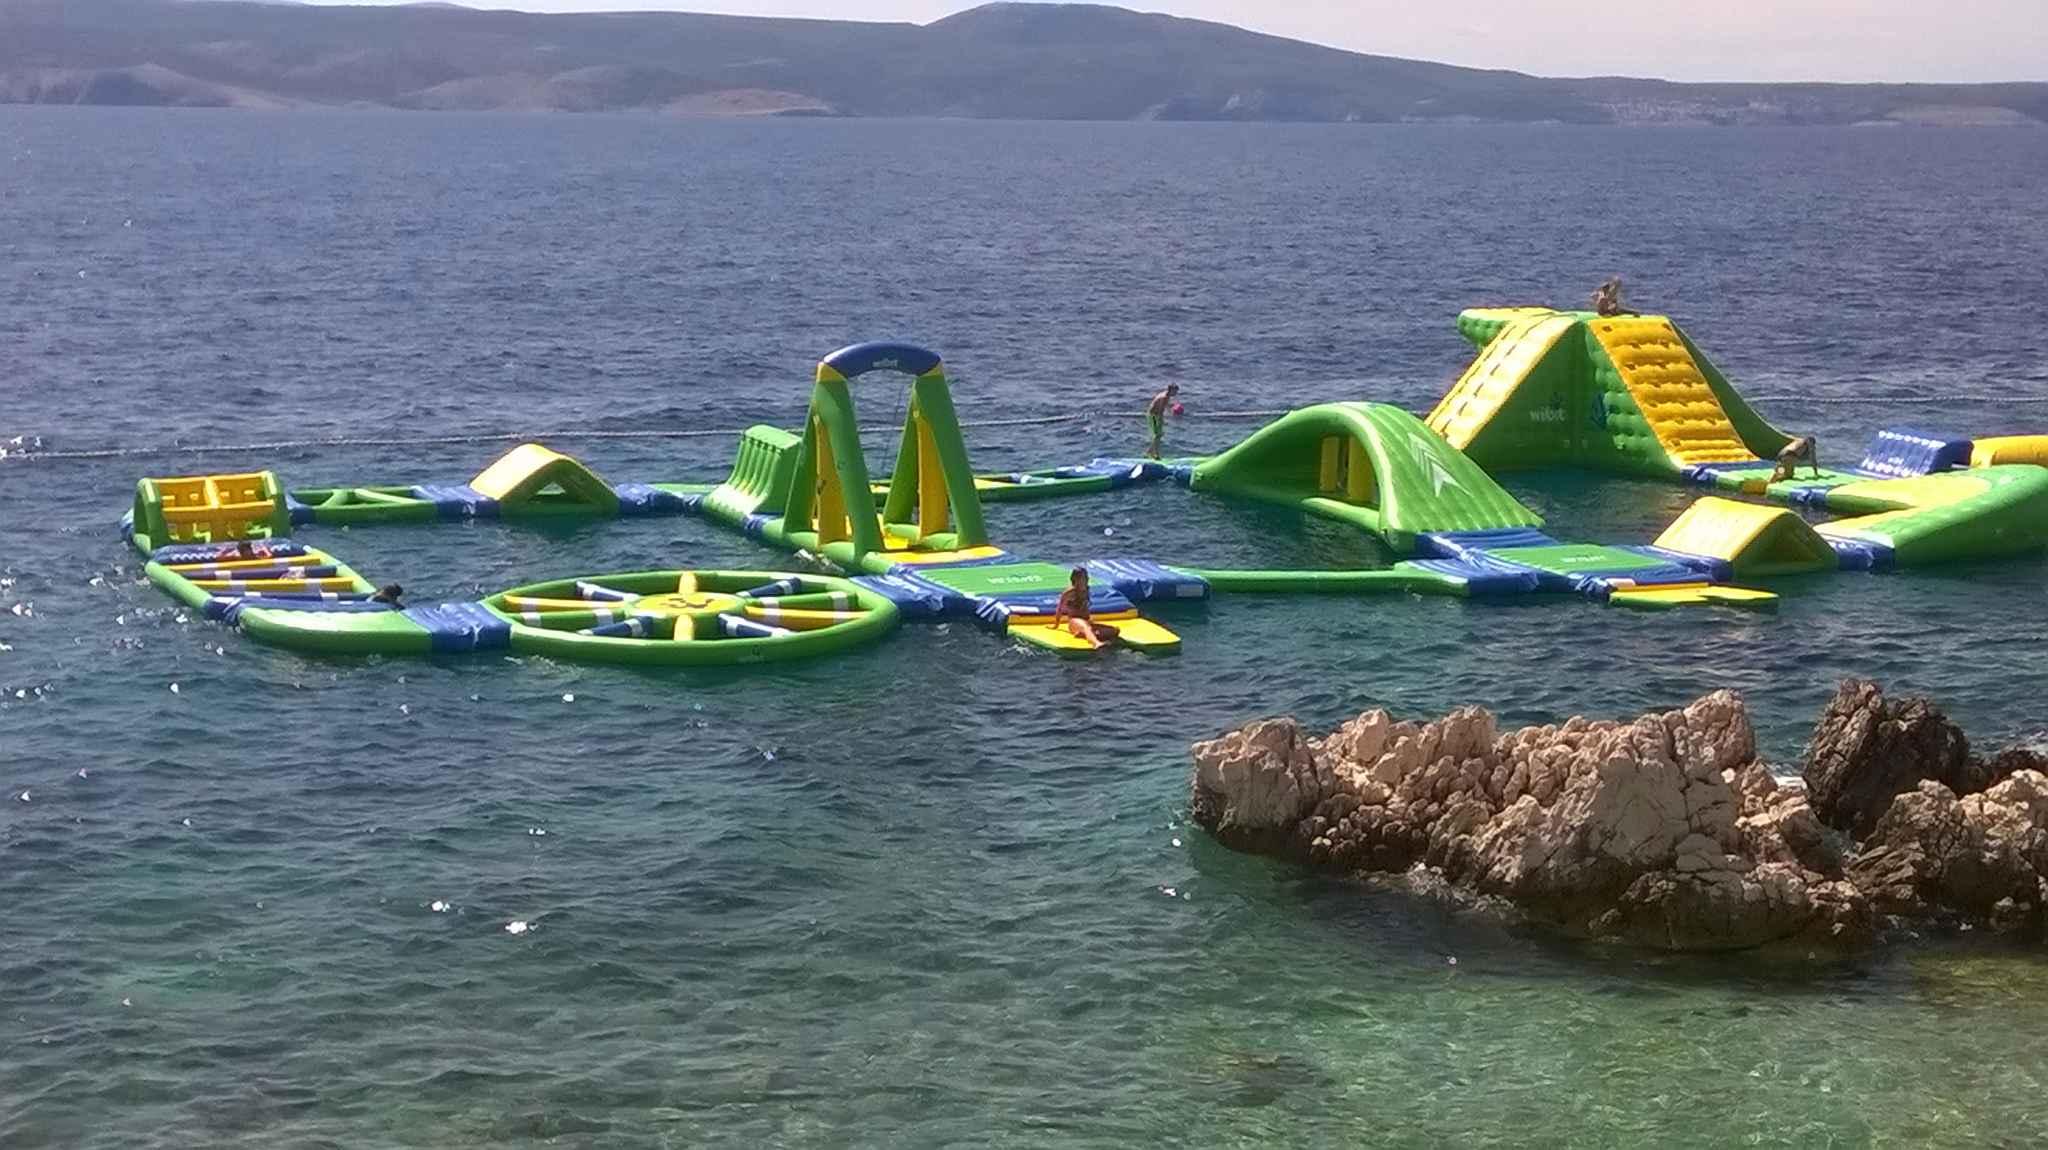 Appartement de vacances nahe von Meer, WI-FI, Klima (2182509), Novi Vinodolski, , Kvarner, Croatie, image 17